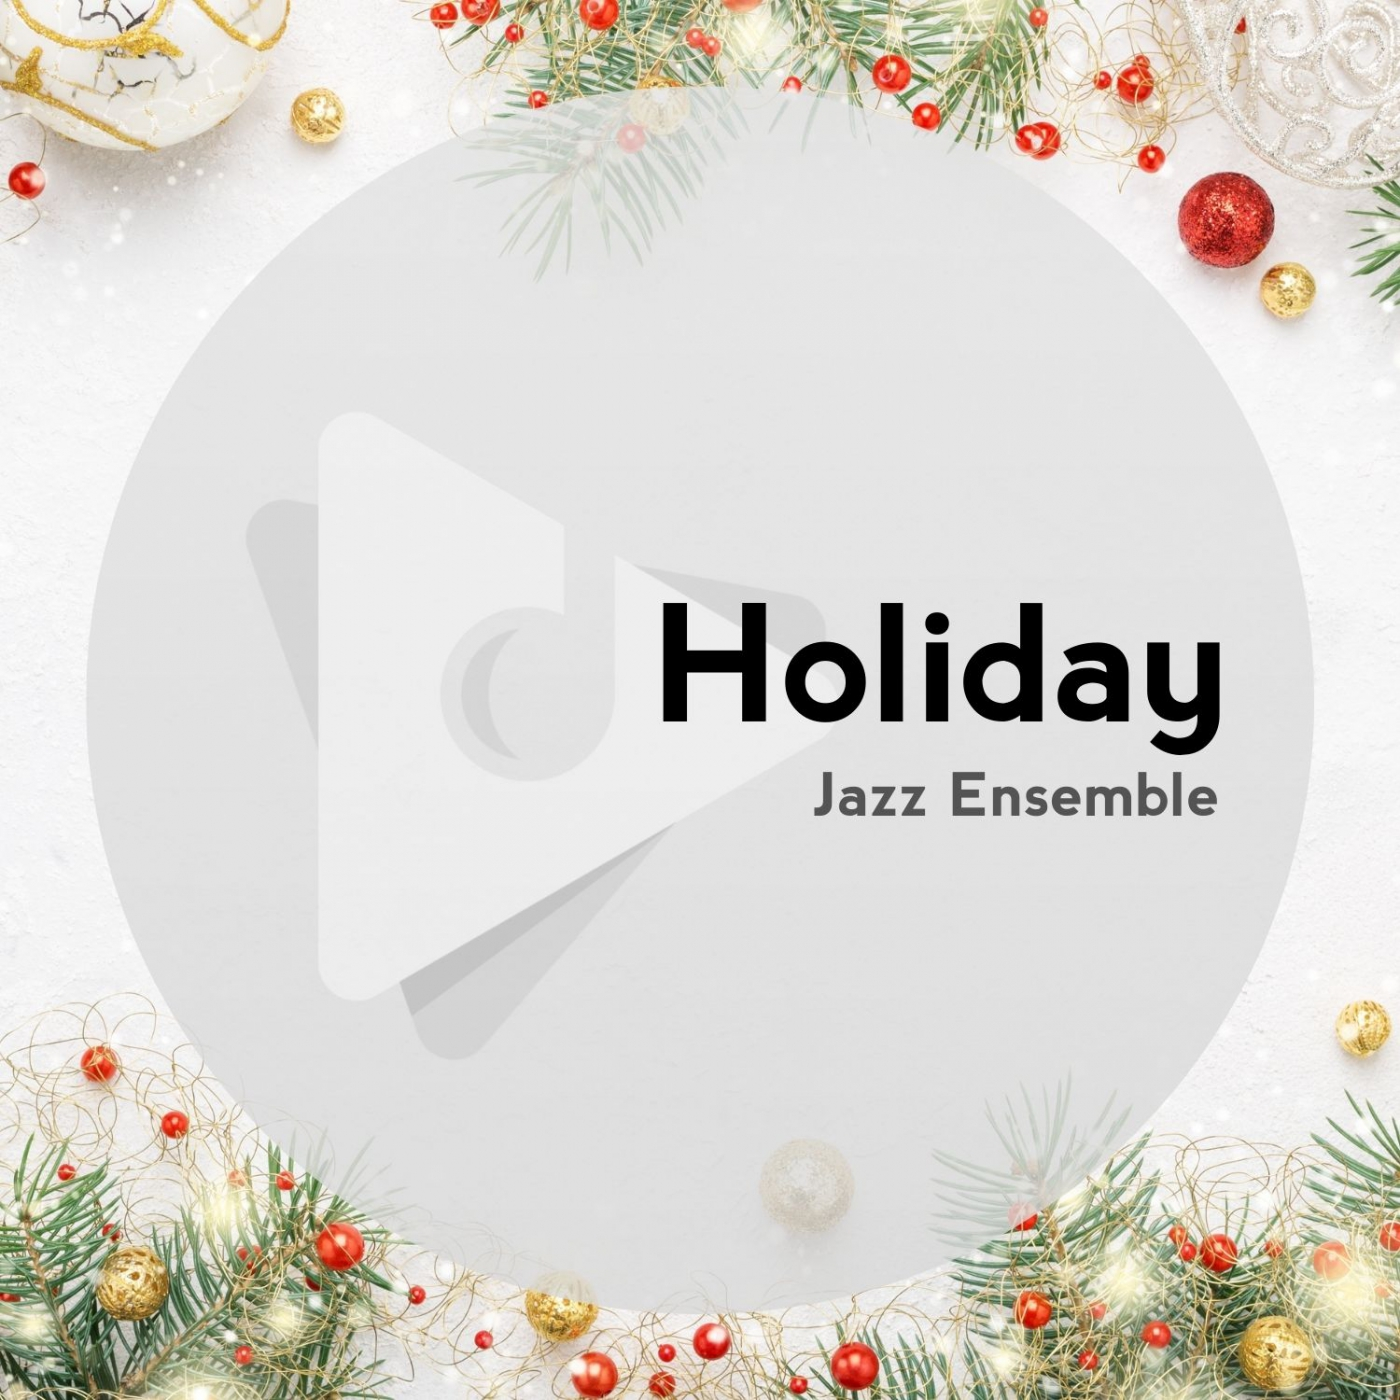 Holiday Jazz Ensemble